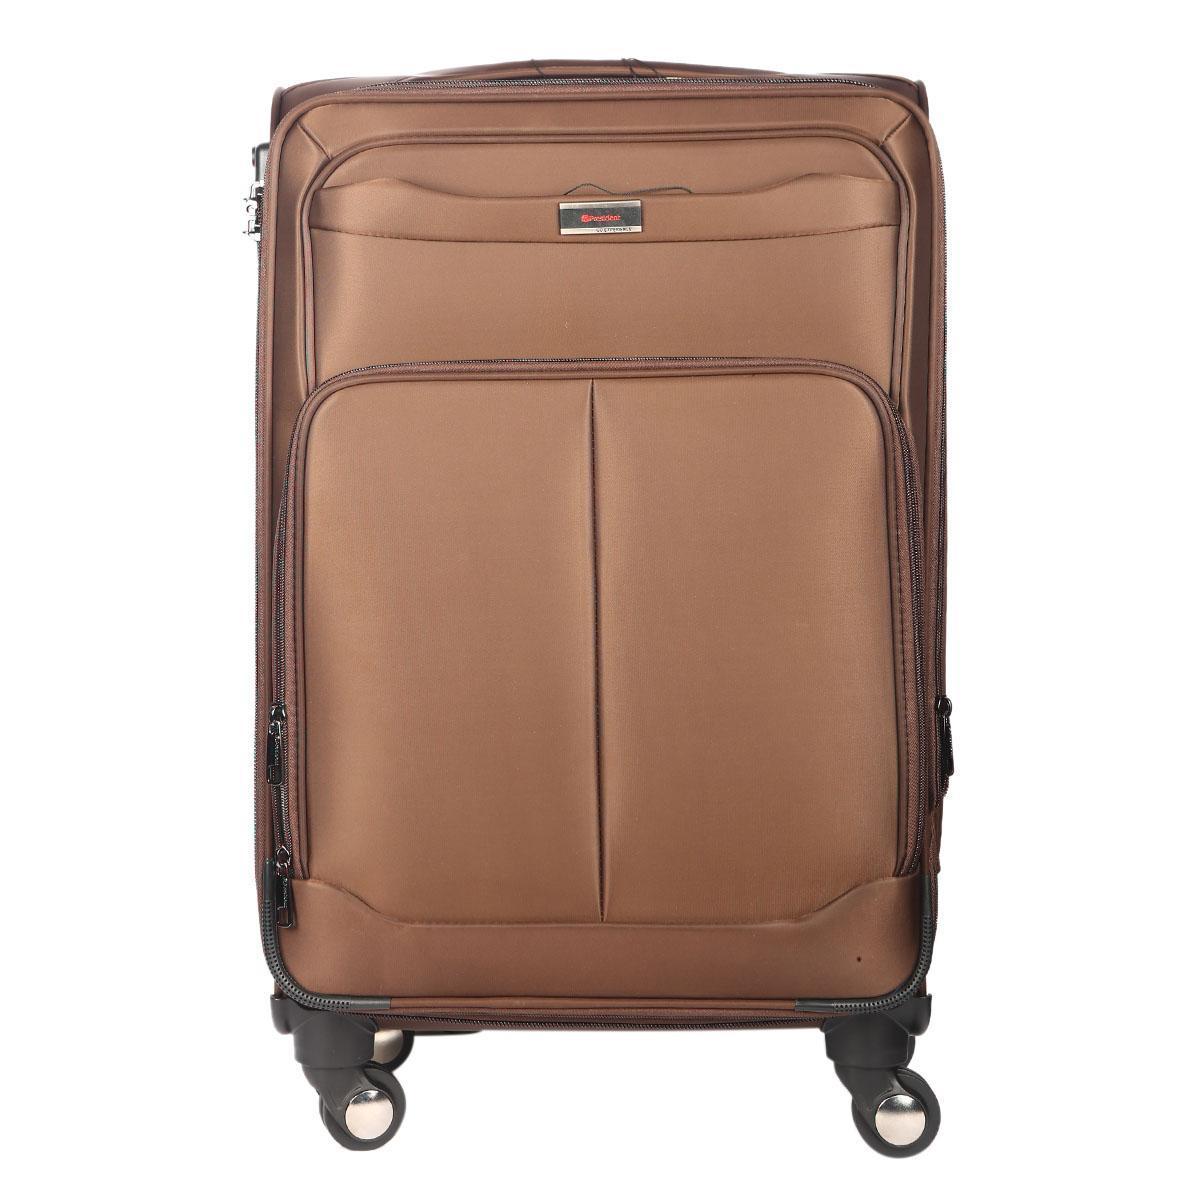 Travel Bag Price In Bangladesh - Buy Trolley Bag From Daraz.com.bd 4c9b3c049cf02